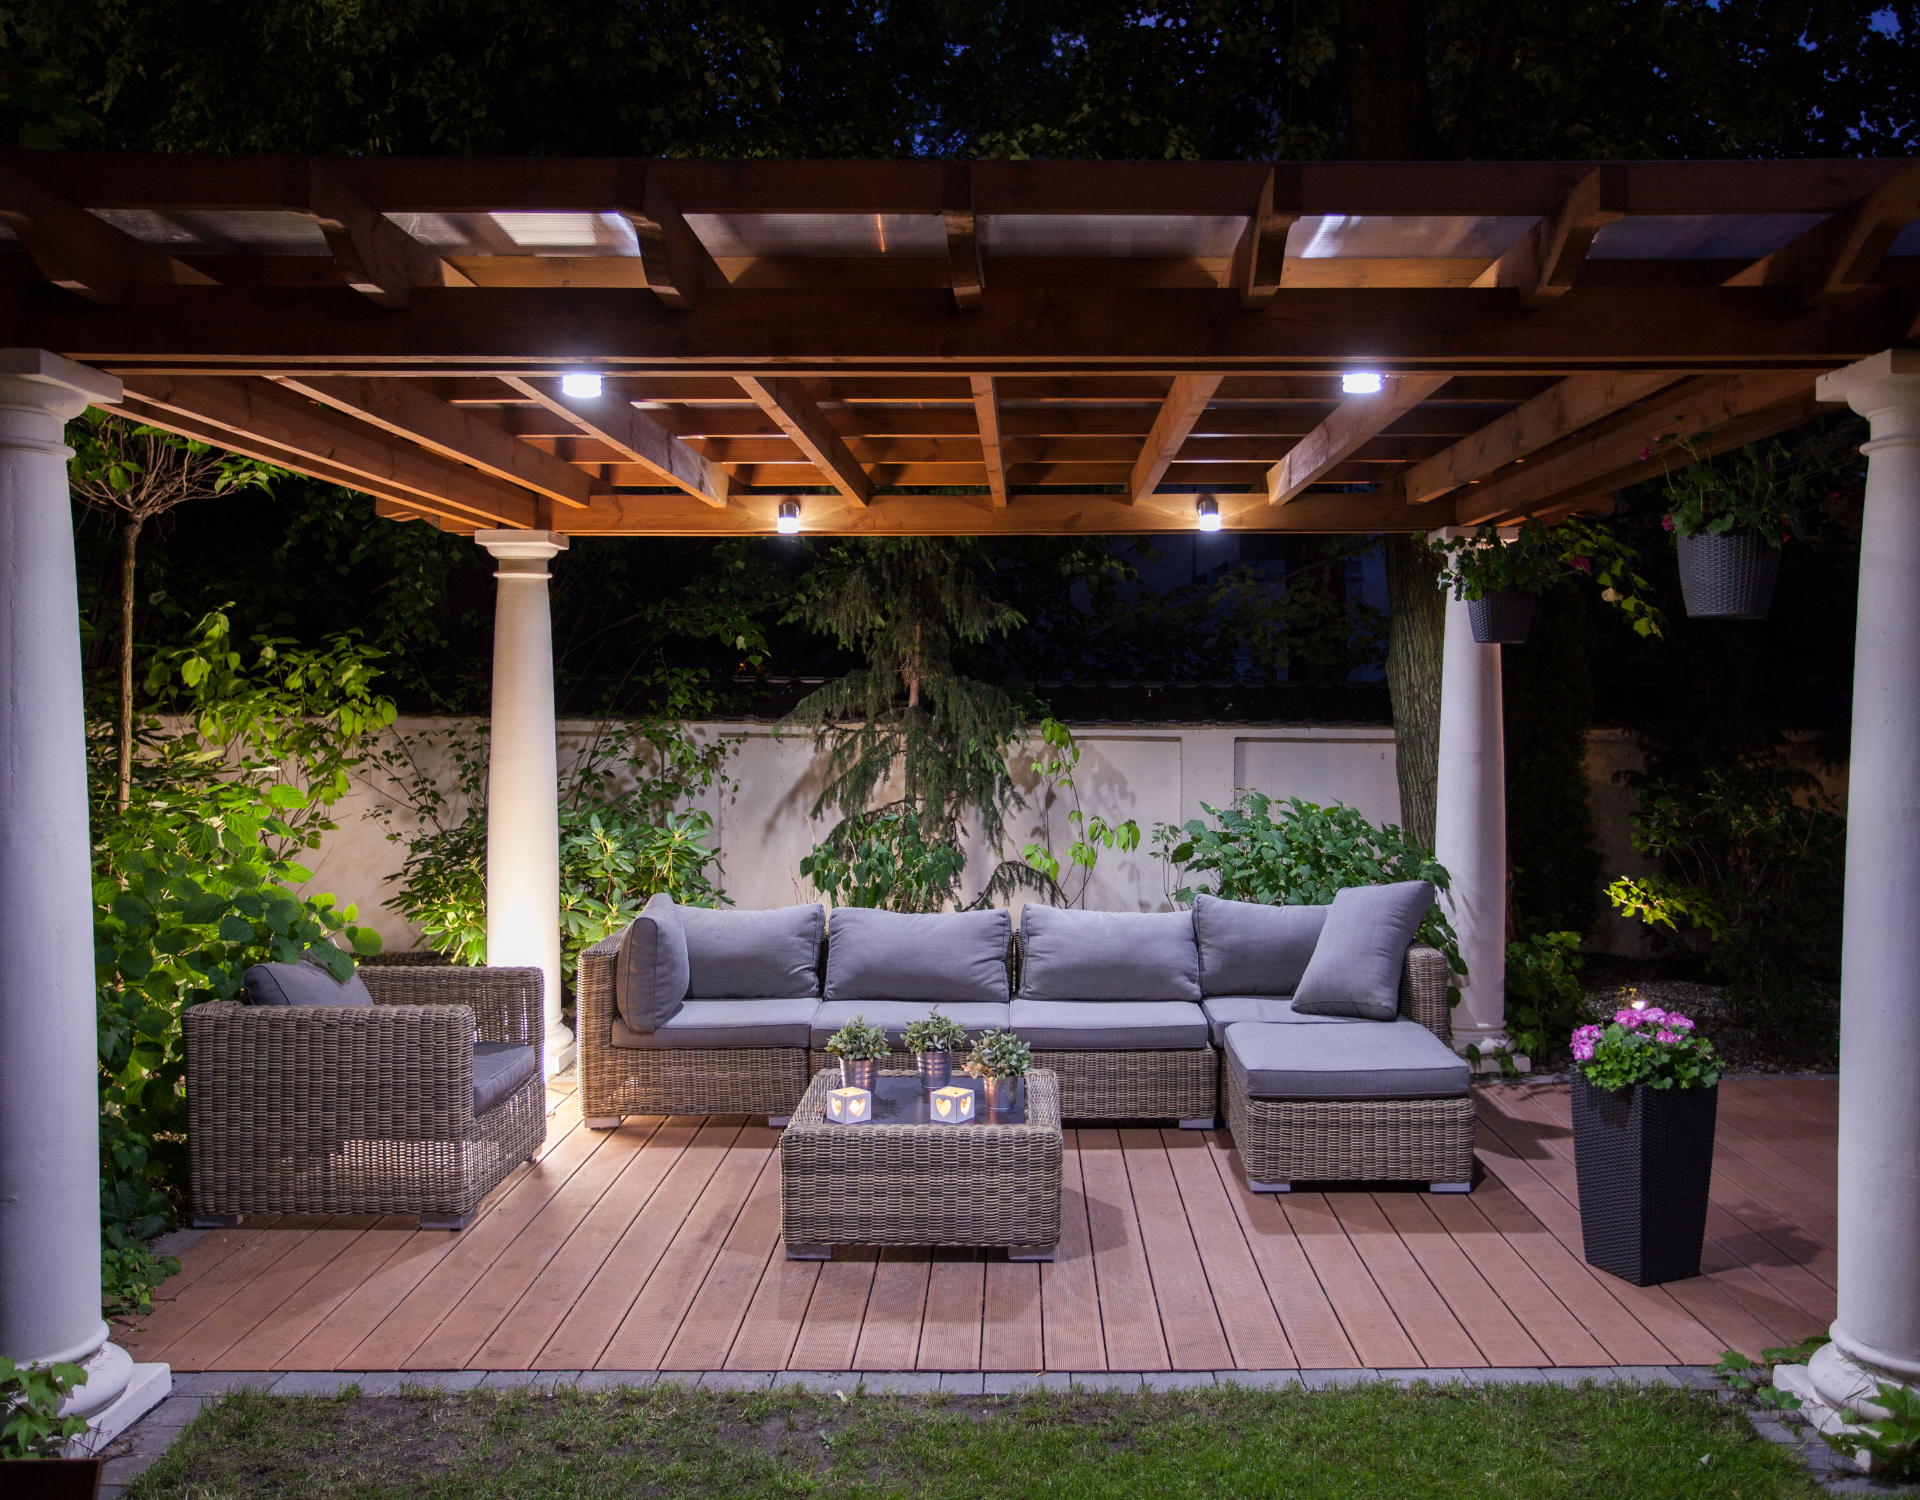 hs-arquitetura-quintal-area-recreacao